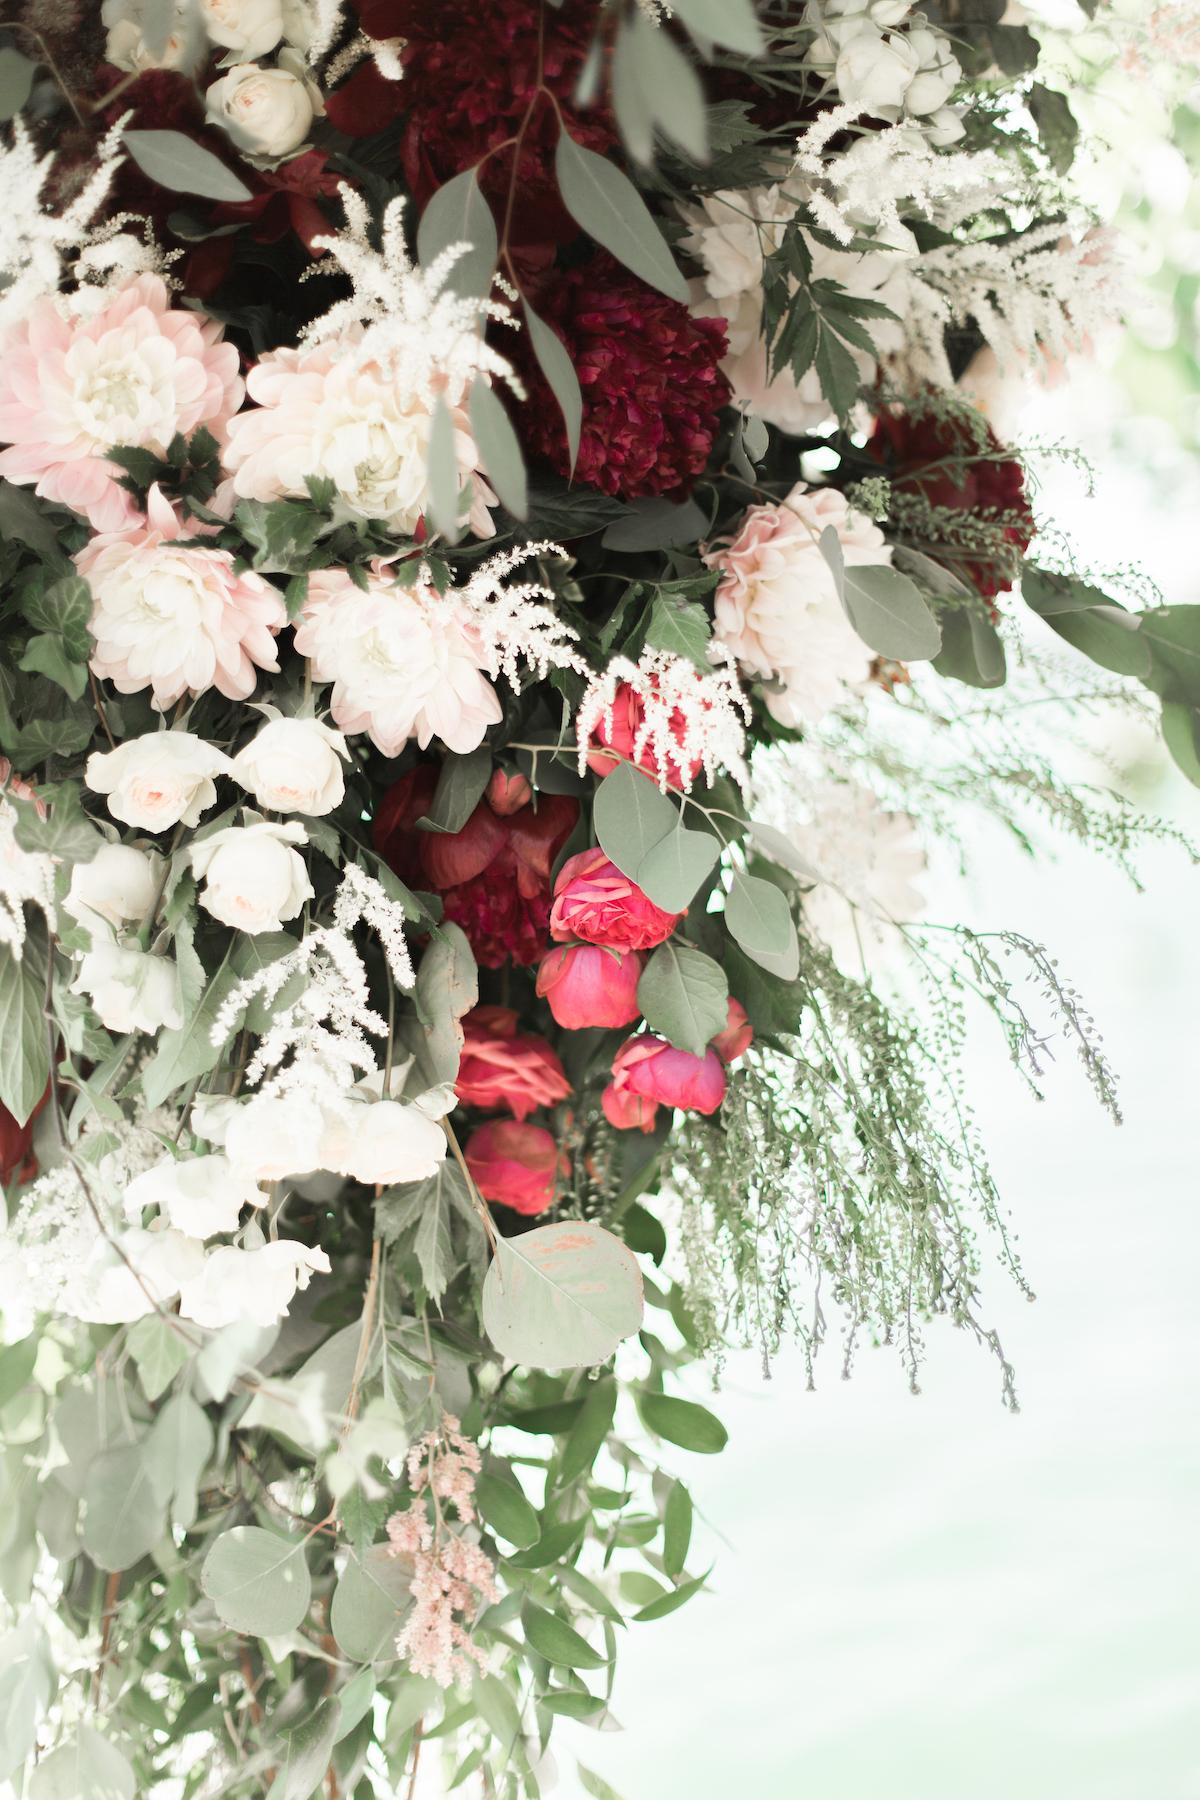 annecy-wedding-photos-166.jpg